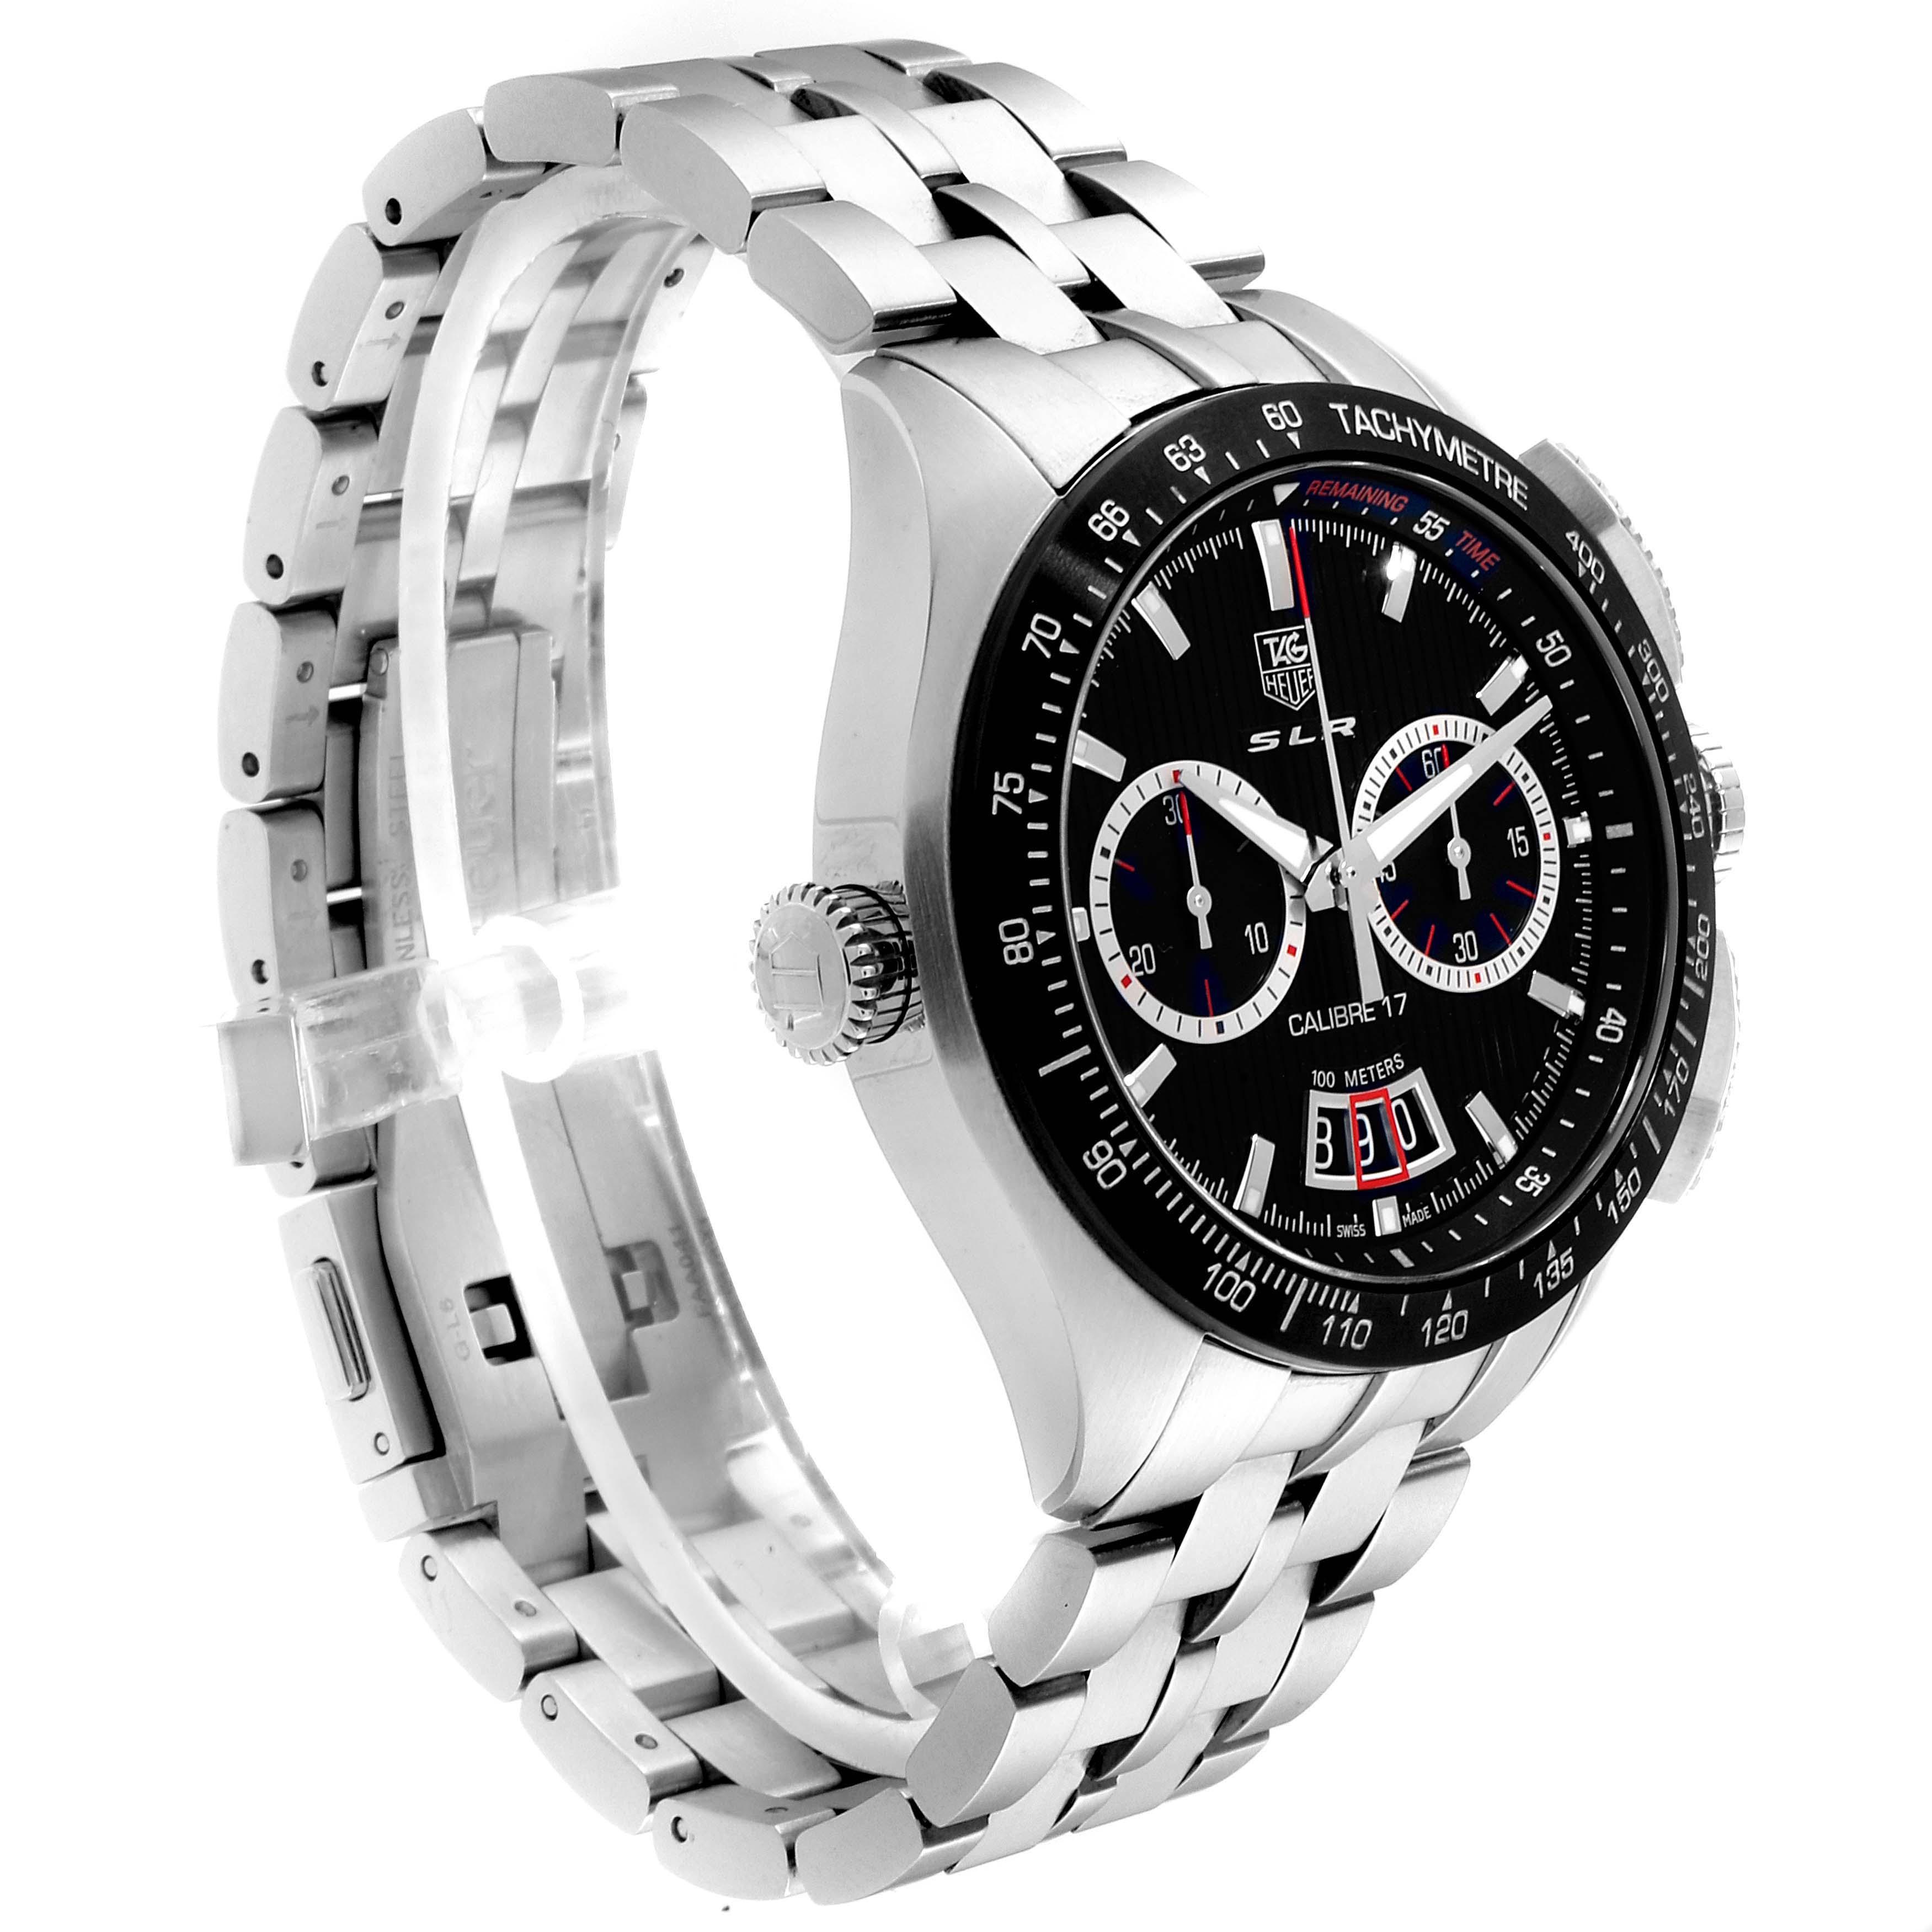 Tag Heuer Mercedez SLR McLaren Chronograph Mens Watch CAG2010 SwissWatchExpo